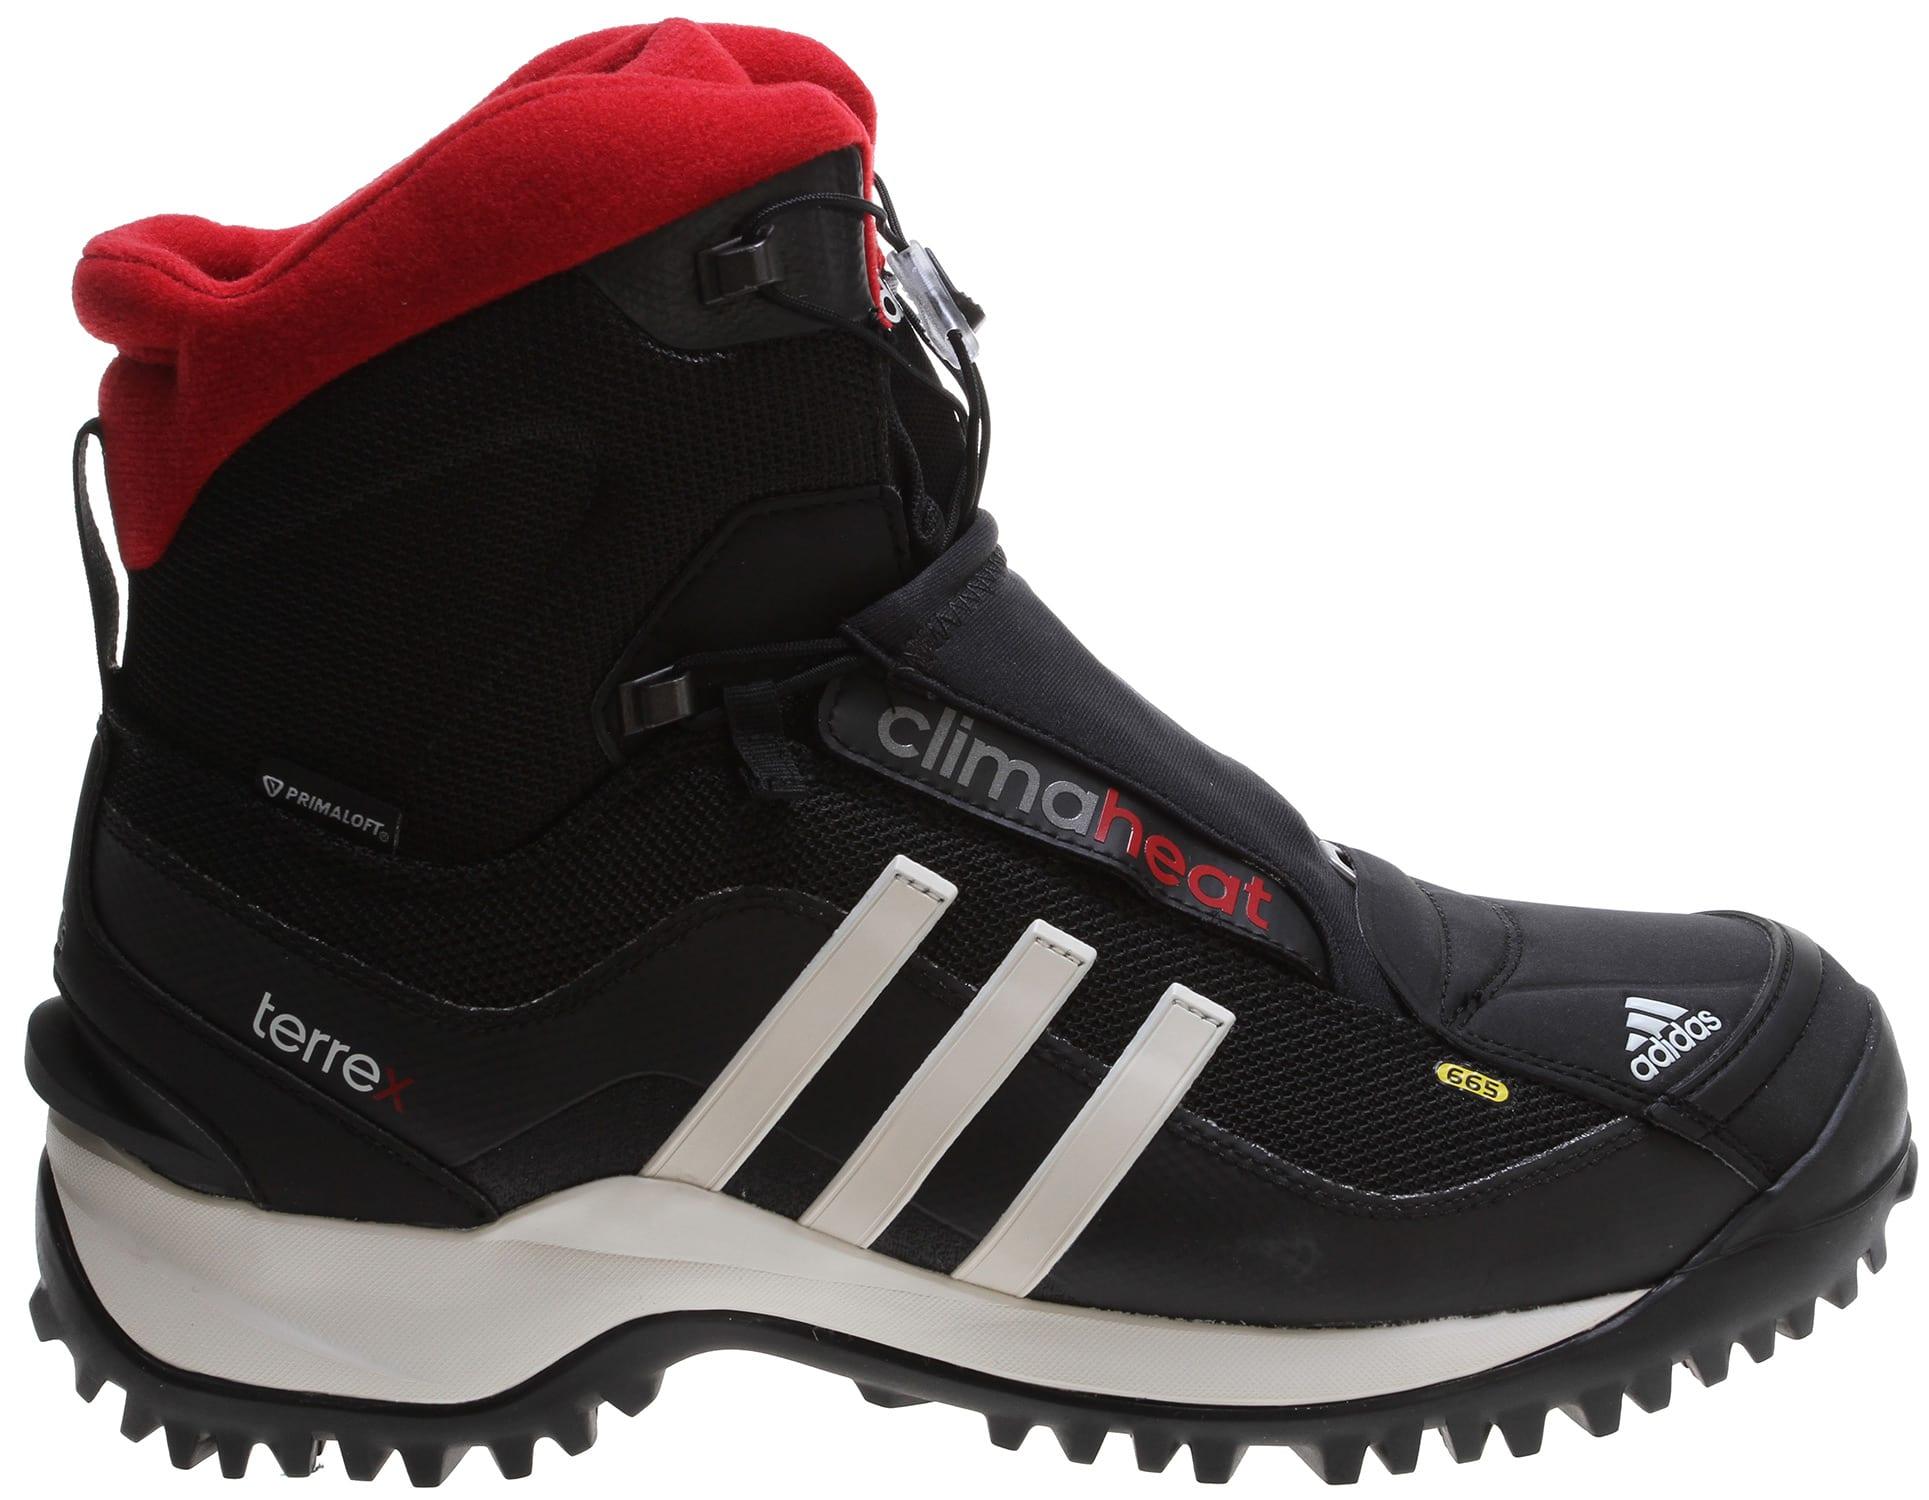 Cheap Adidas Originals Shoes For Sale Online In Australia